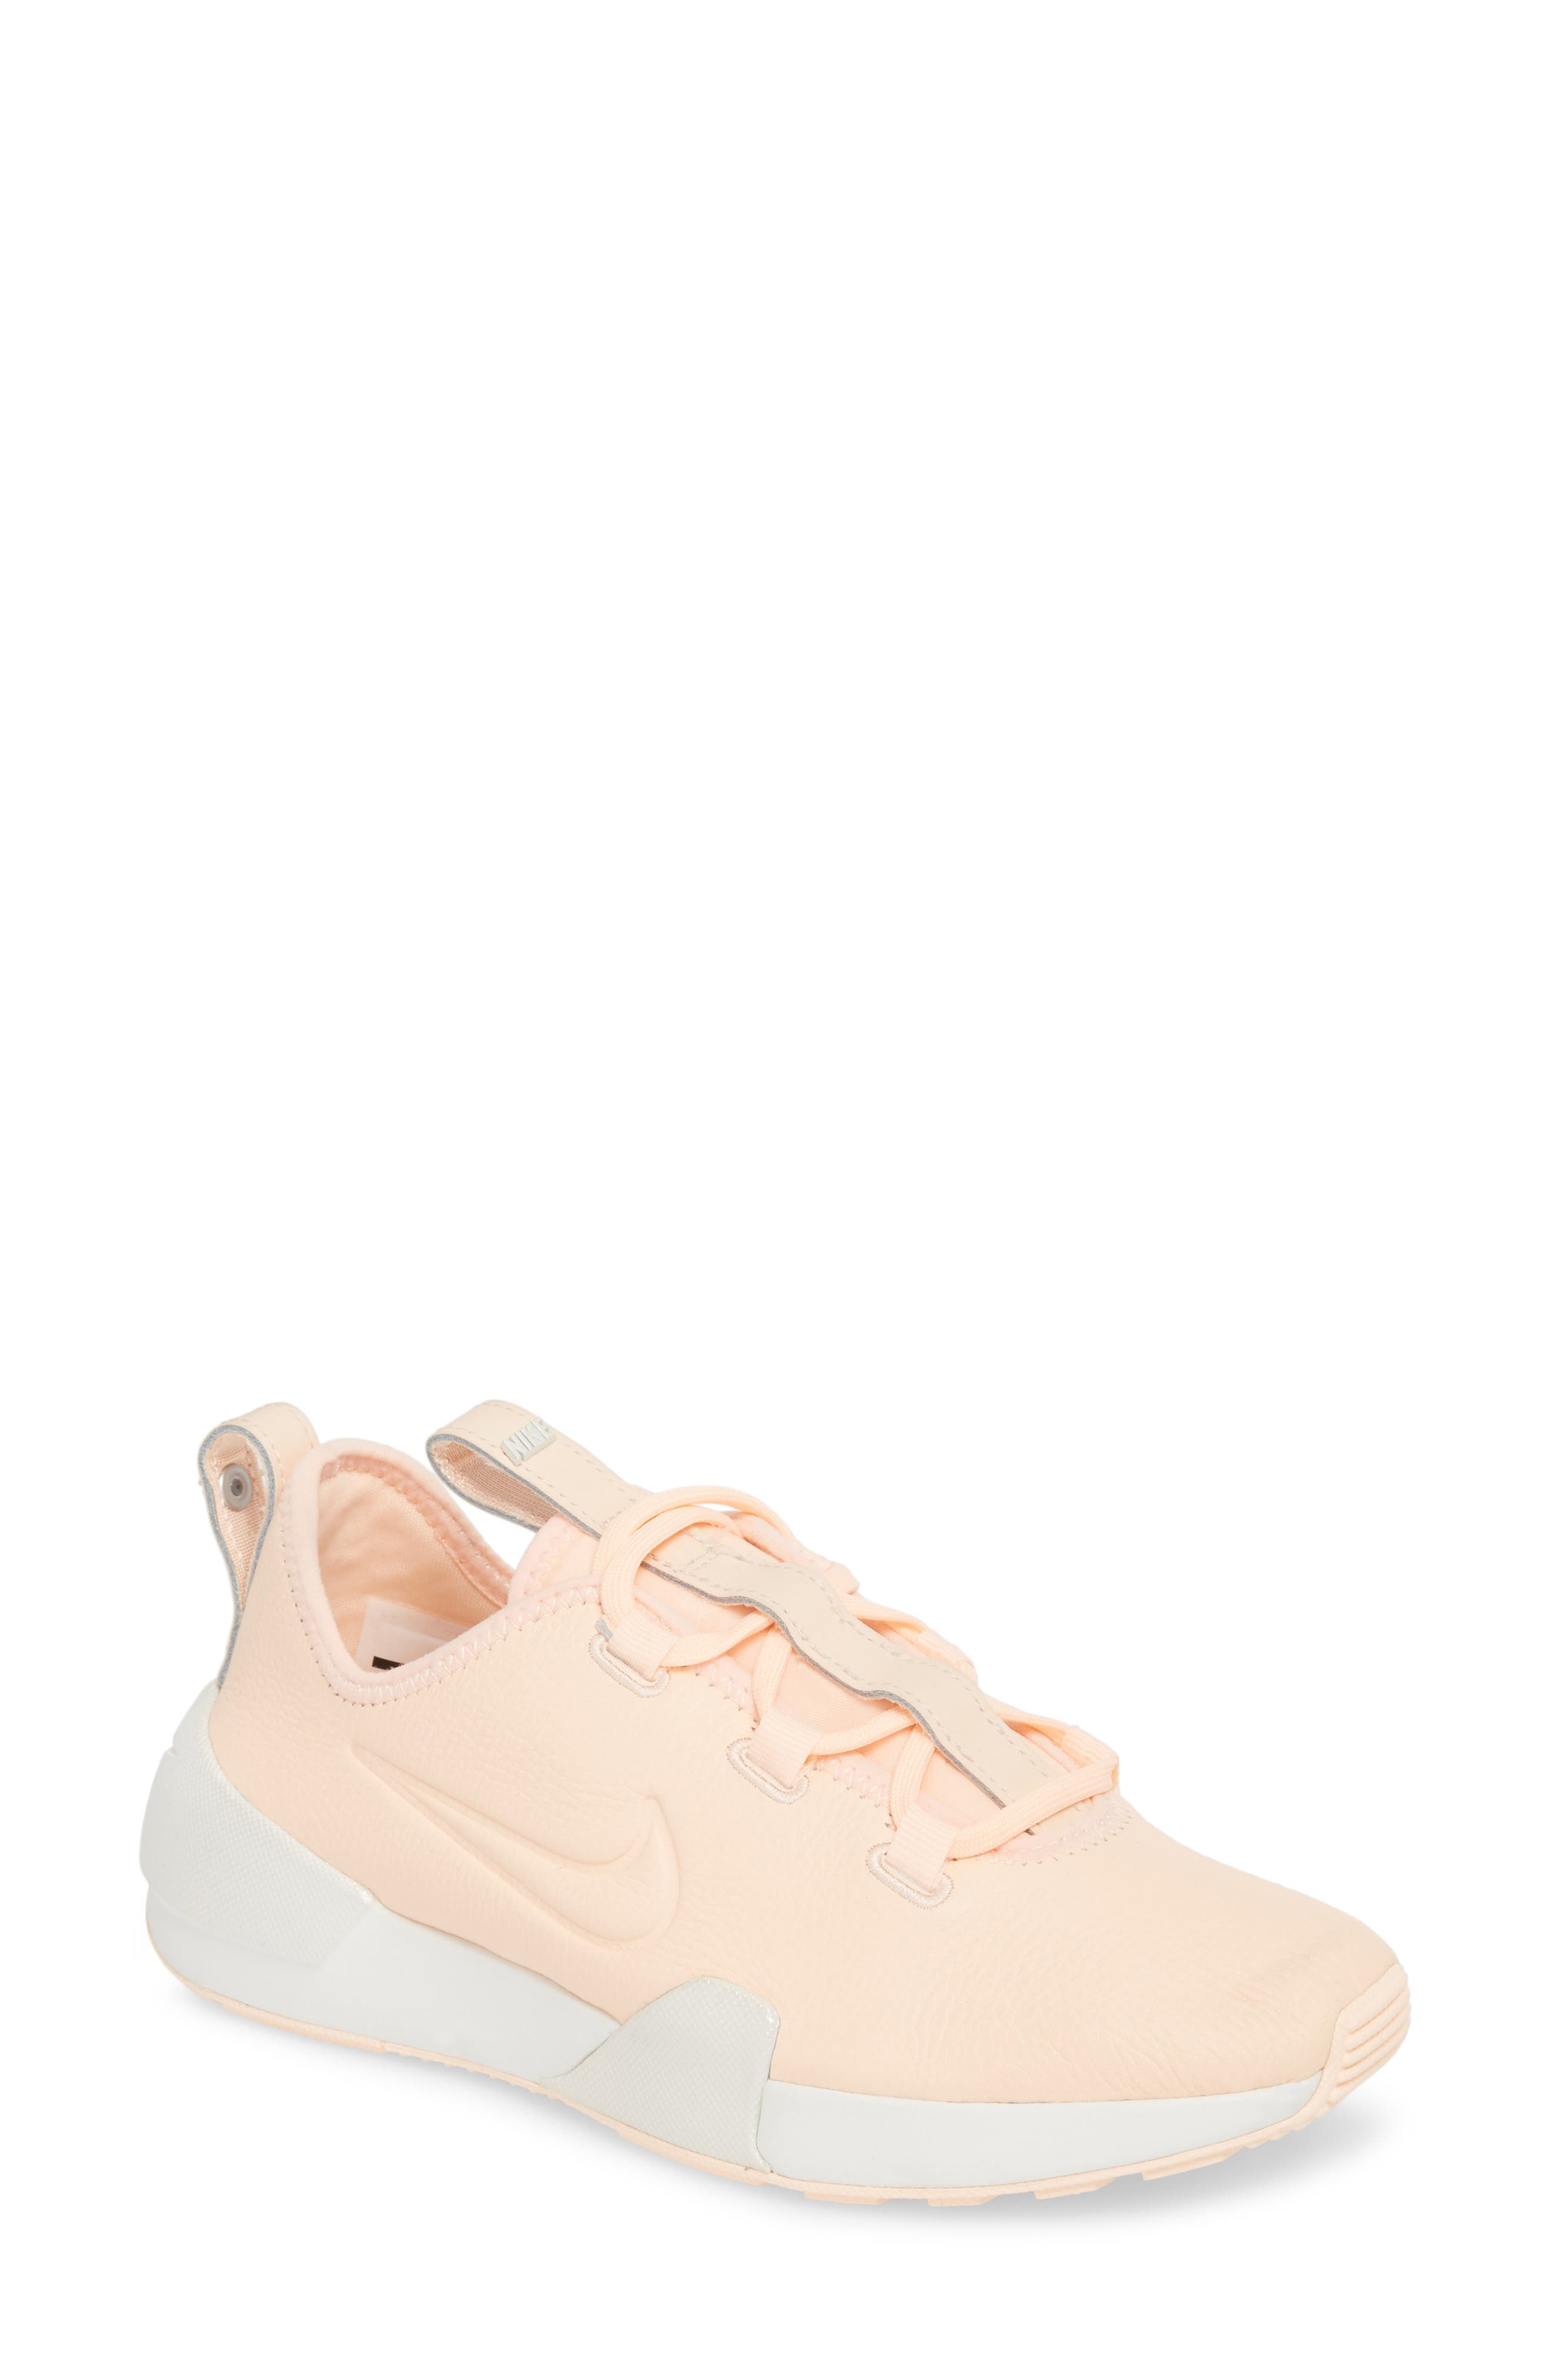 Ashin Modern LX Sneaker,                         Main,                         color, 800